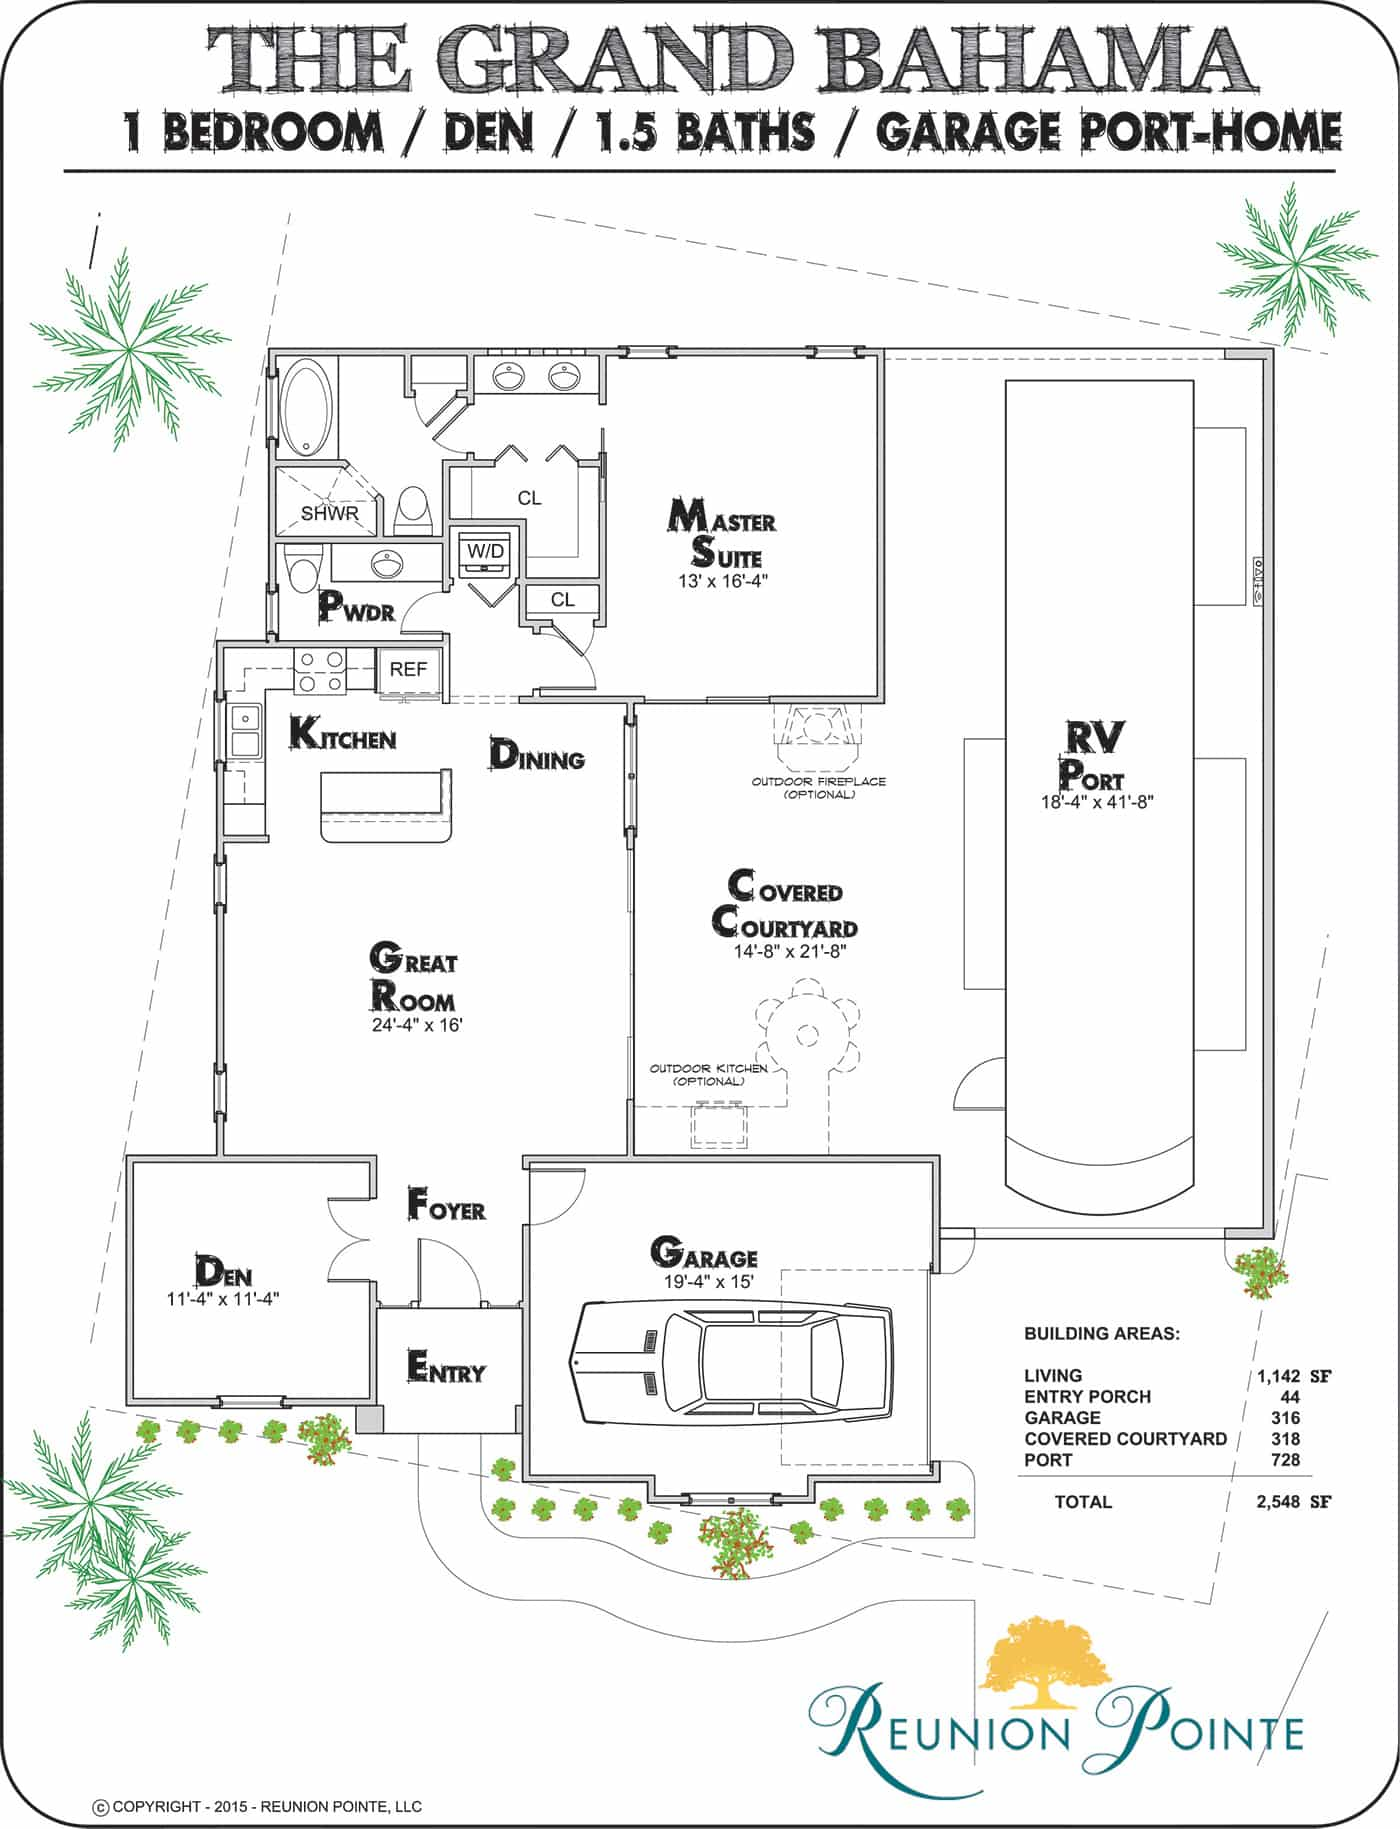 Grand Bahama RV Port-Home Model Floorplan